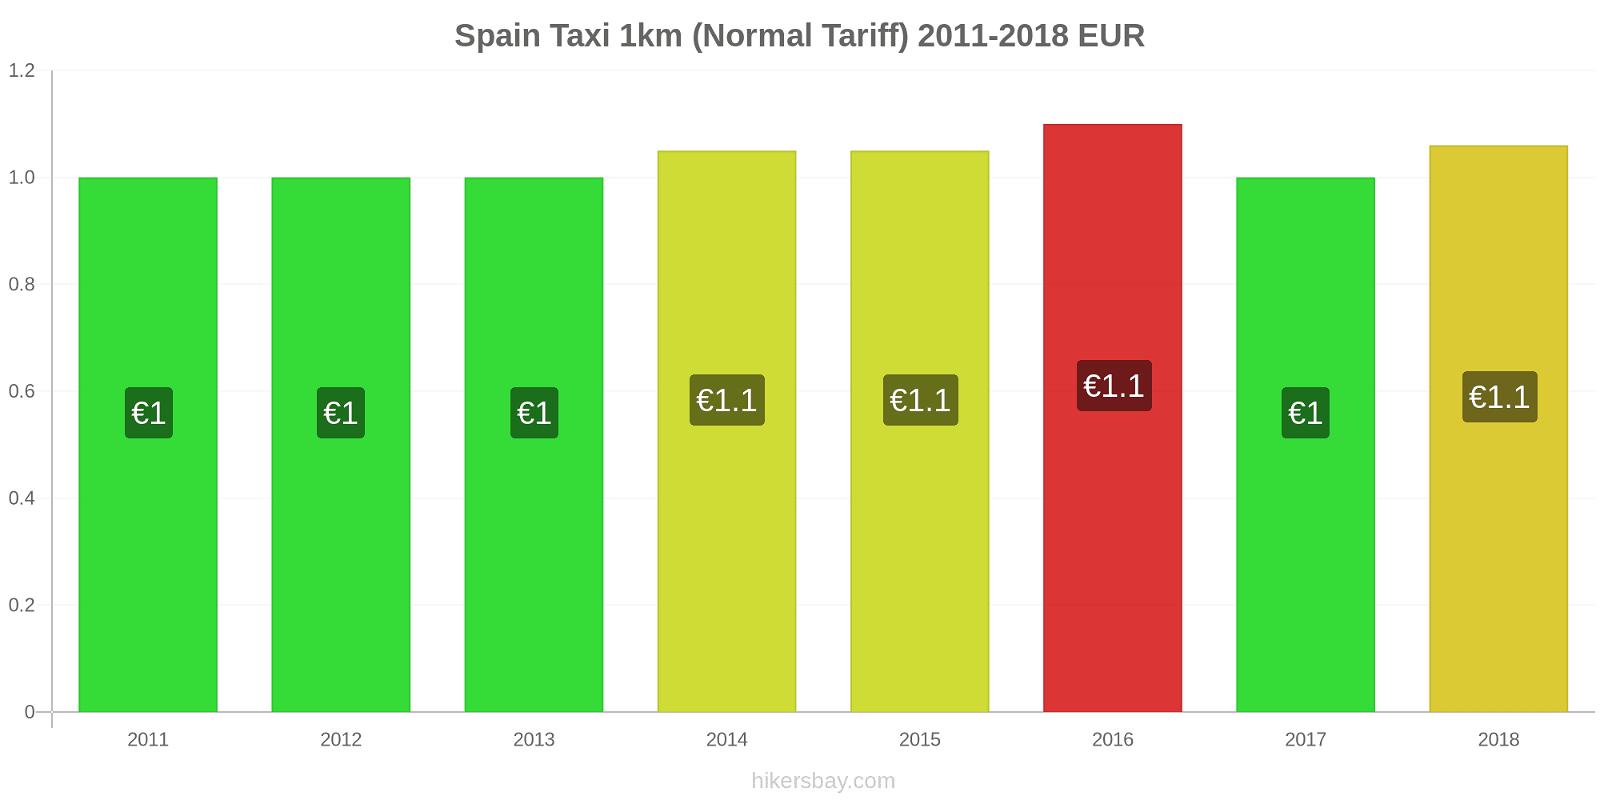 Spain price changes Taxi 1km (Normal Tariff) hikersbay.com